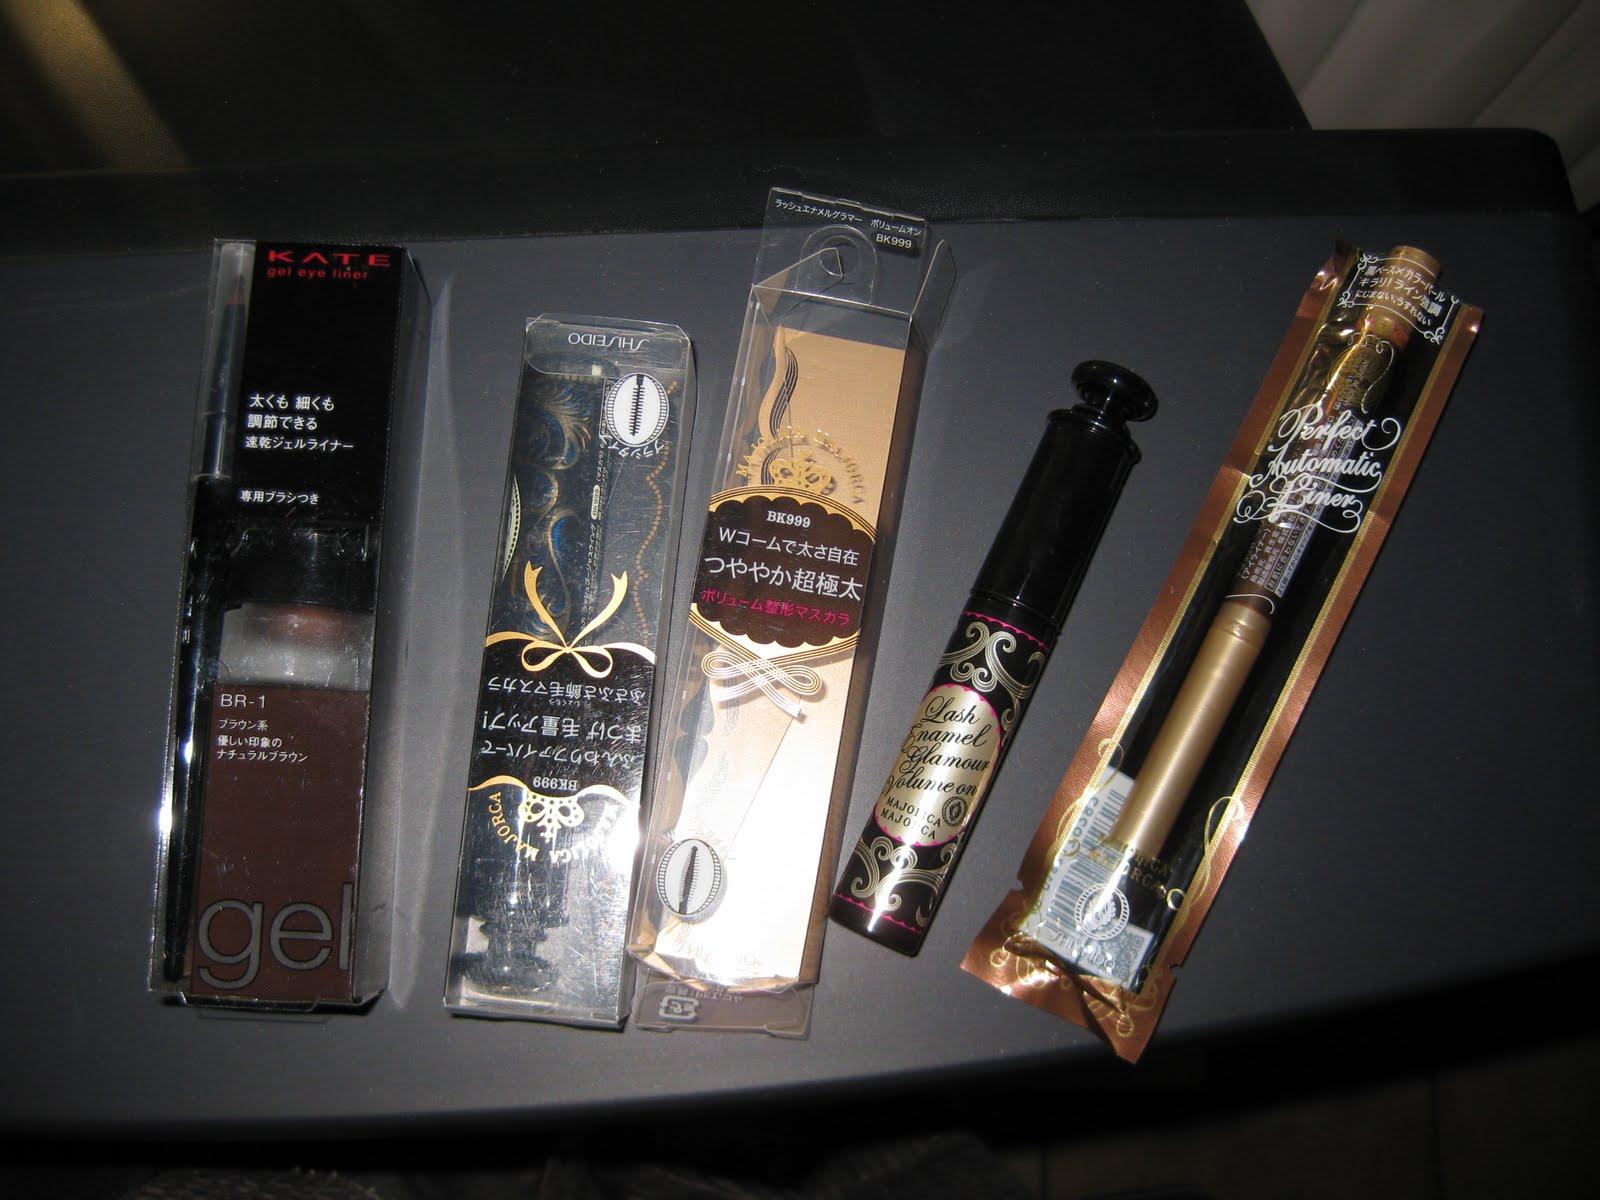 japanese cosmetics brands-19